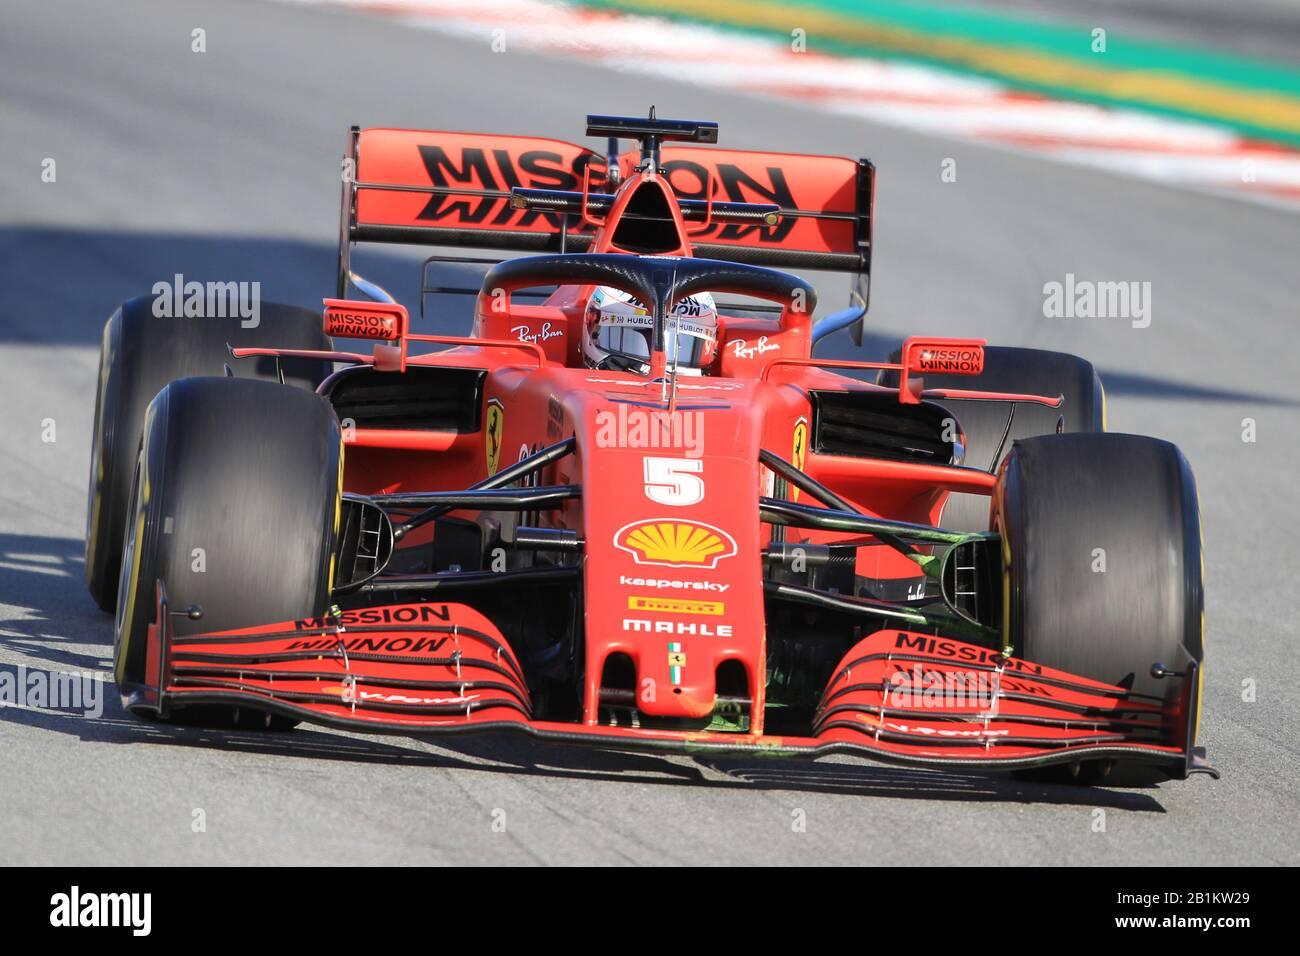 26 De Febrero De 2020; Circuit De Barcelona Catalunya, Barcelona, Cataluña, España; Formula 1 Pre-Season Testing Two; Scuderia Ferrari, Sebastian Vettel Foto de stock